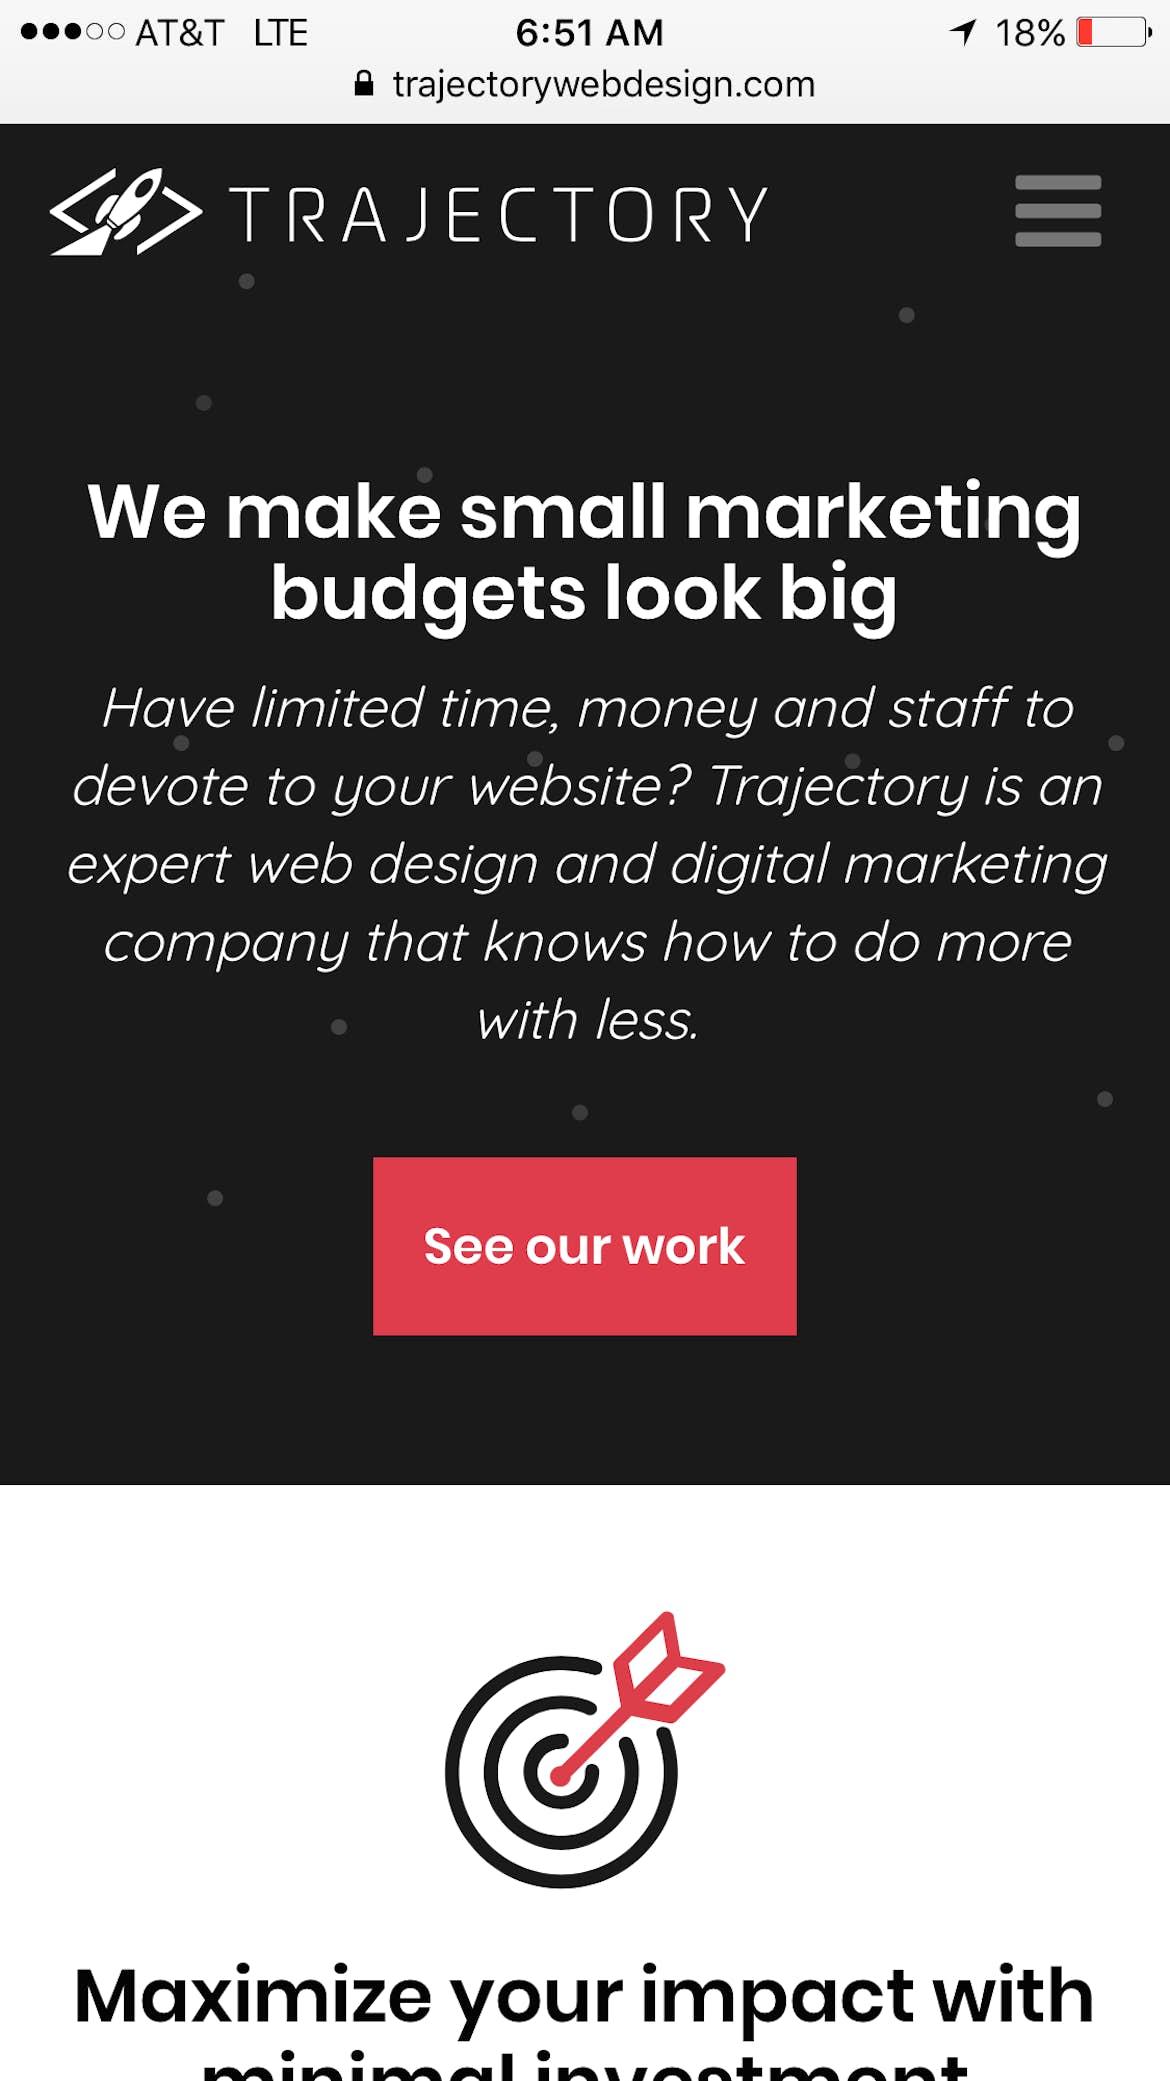 Trajectory web design mobile site